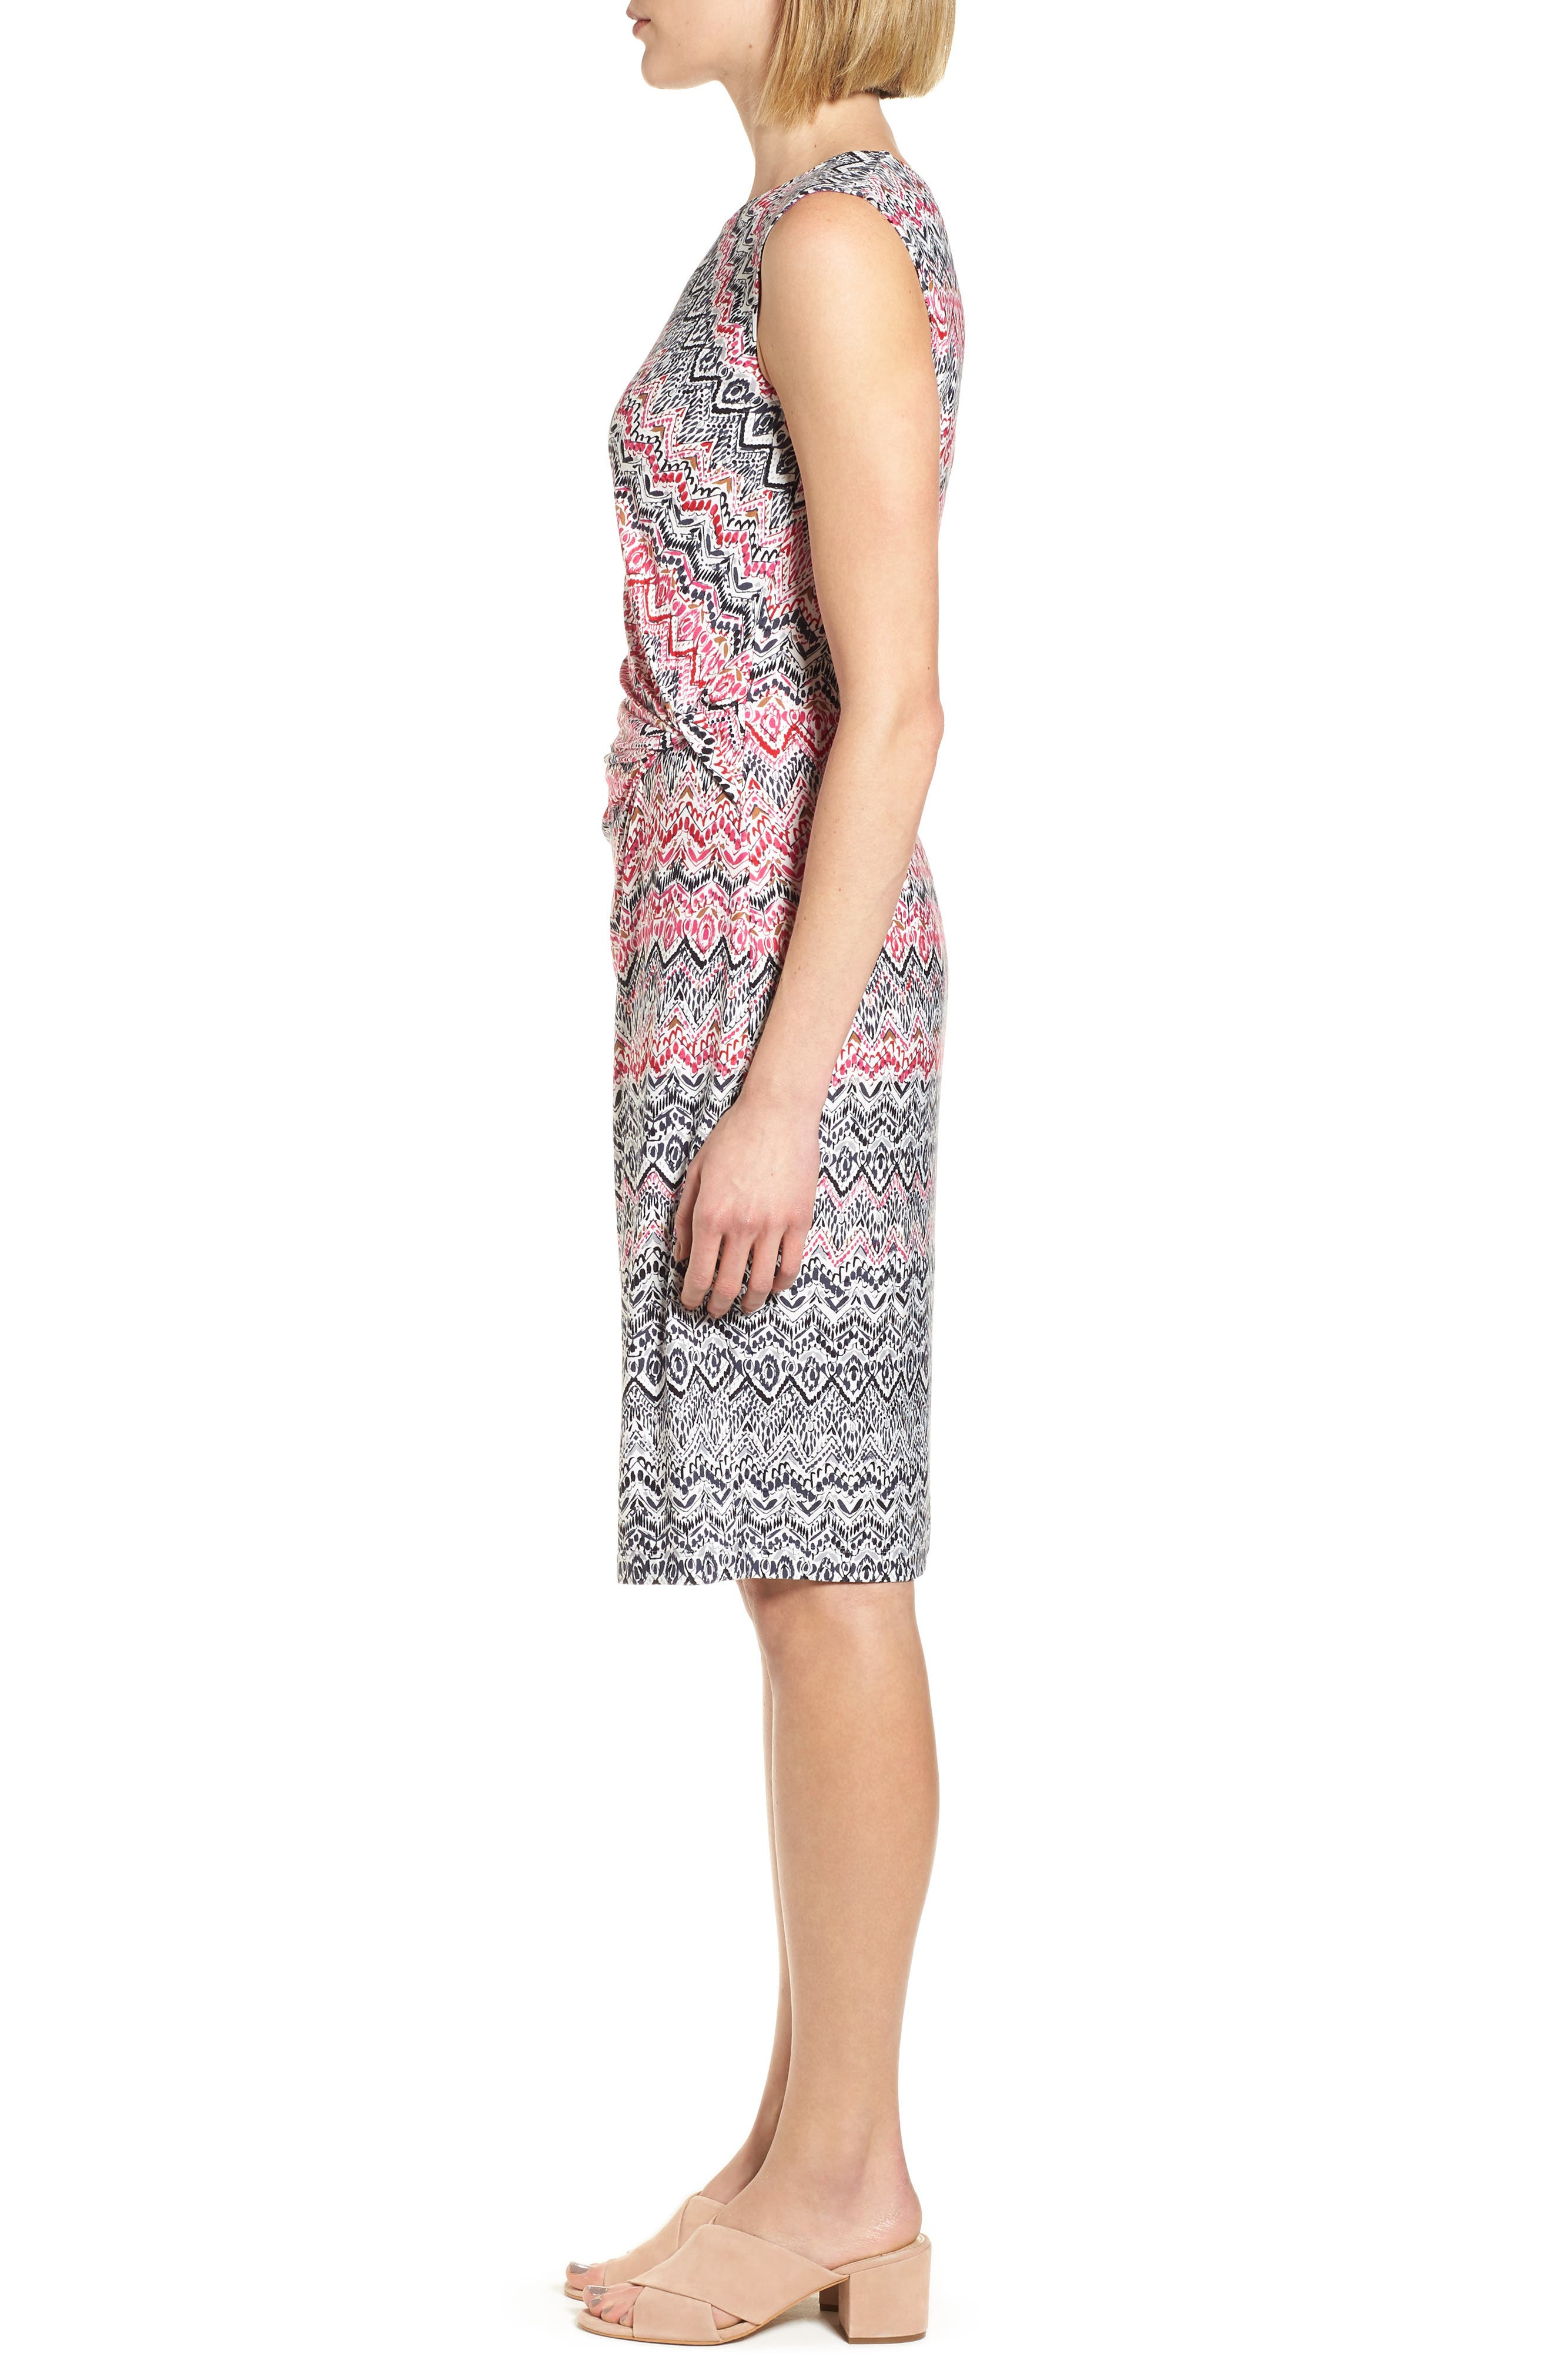 Alternate Image 3  - NIC+ZOE Spiced Up Twist Sheath Dress (Regular & Petite)